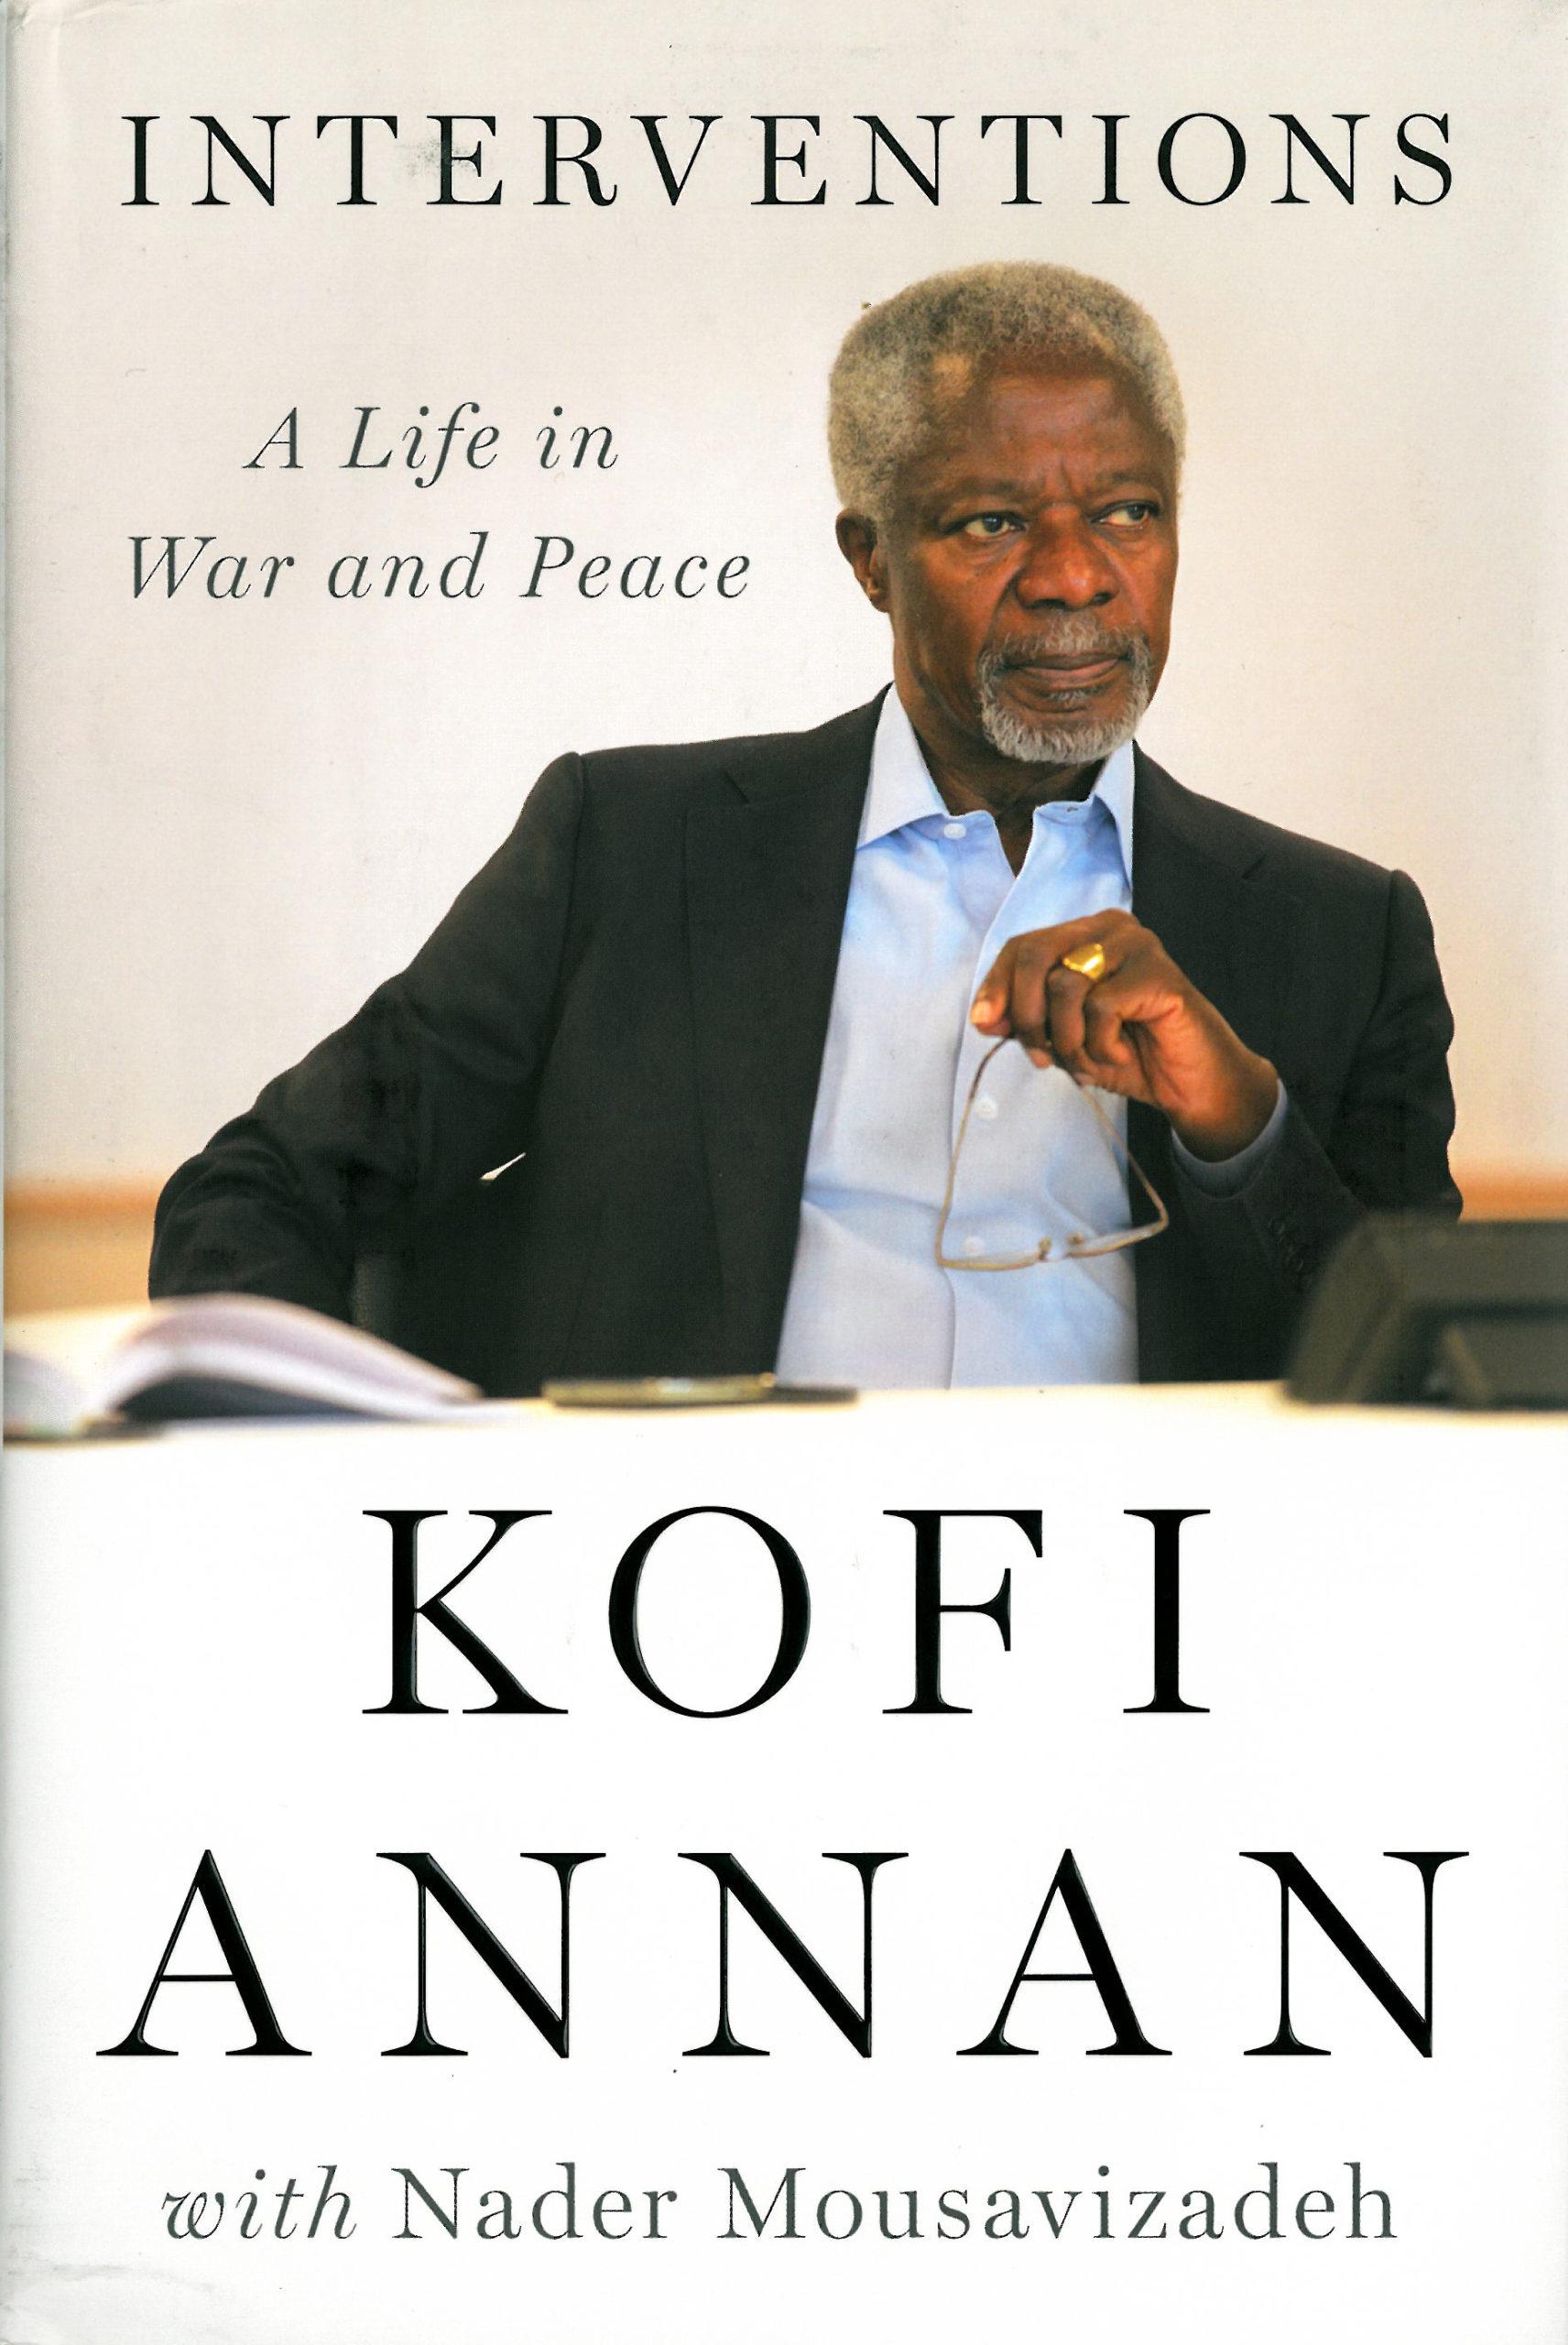 Kofi Annan & Nader Mousavizadeh: Interventions. A Life in War and Peace. The Penguin Press 2012, 383 s.